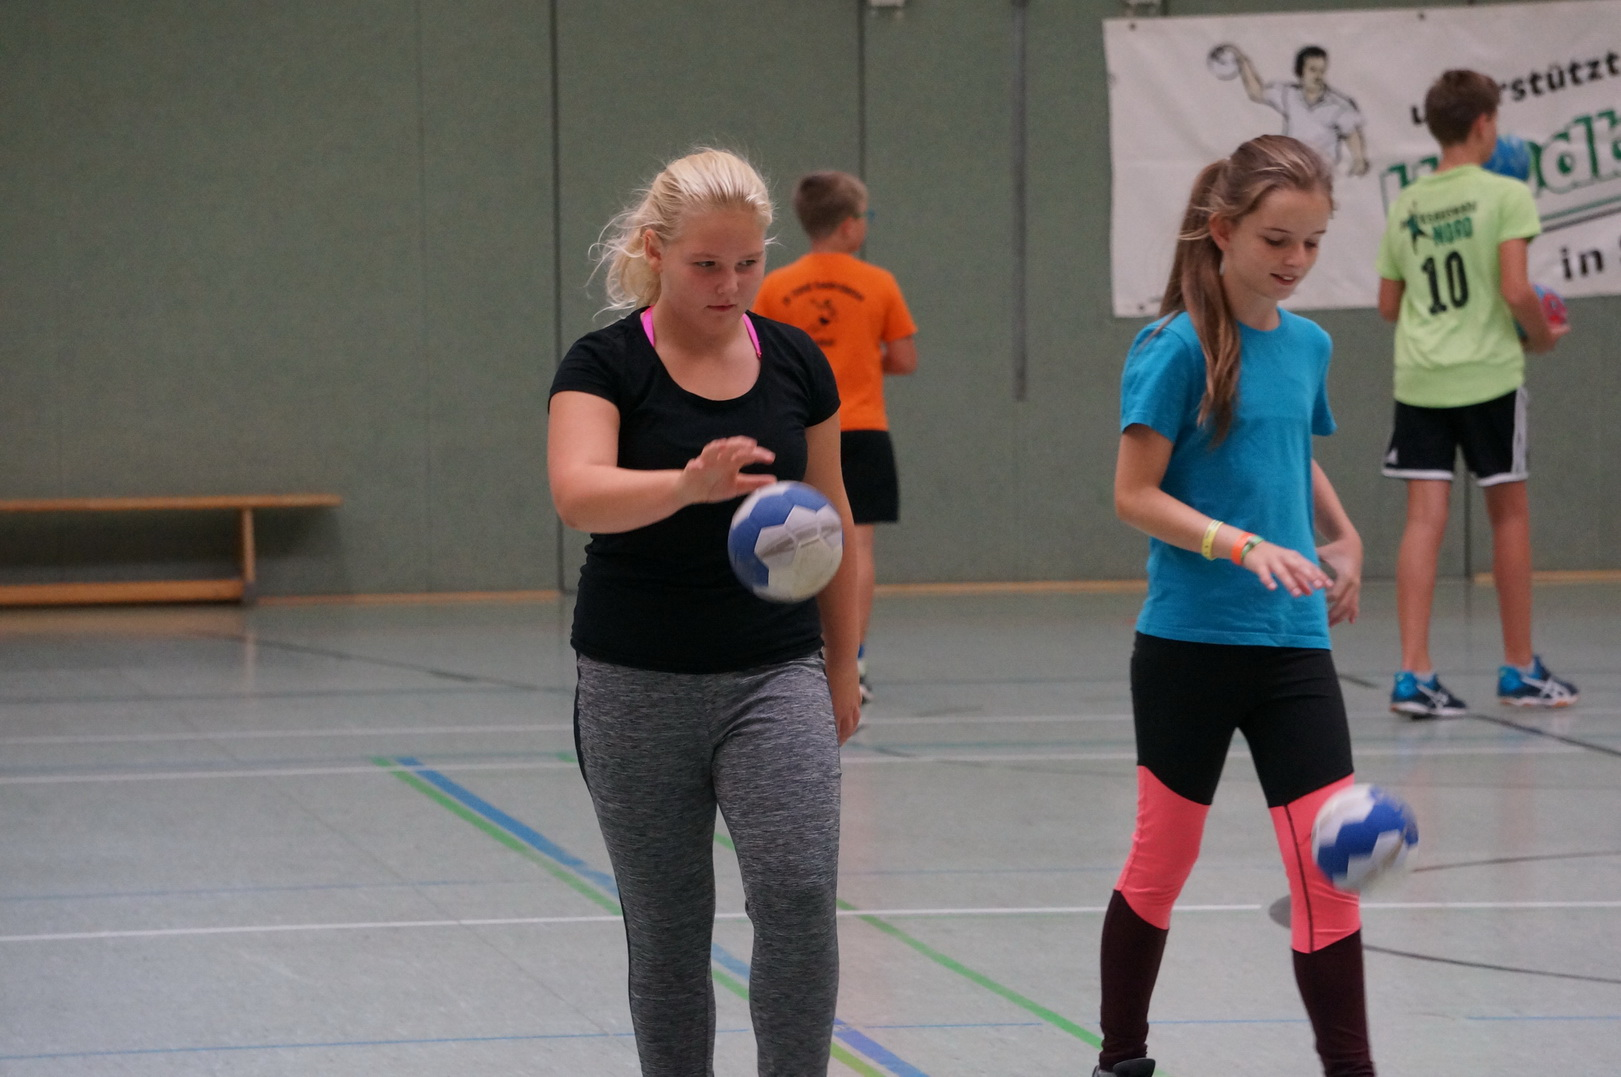 201808_Handballcamp_SDH_MG_038w